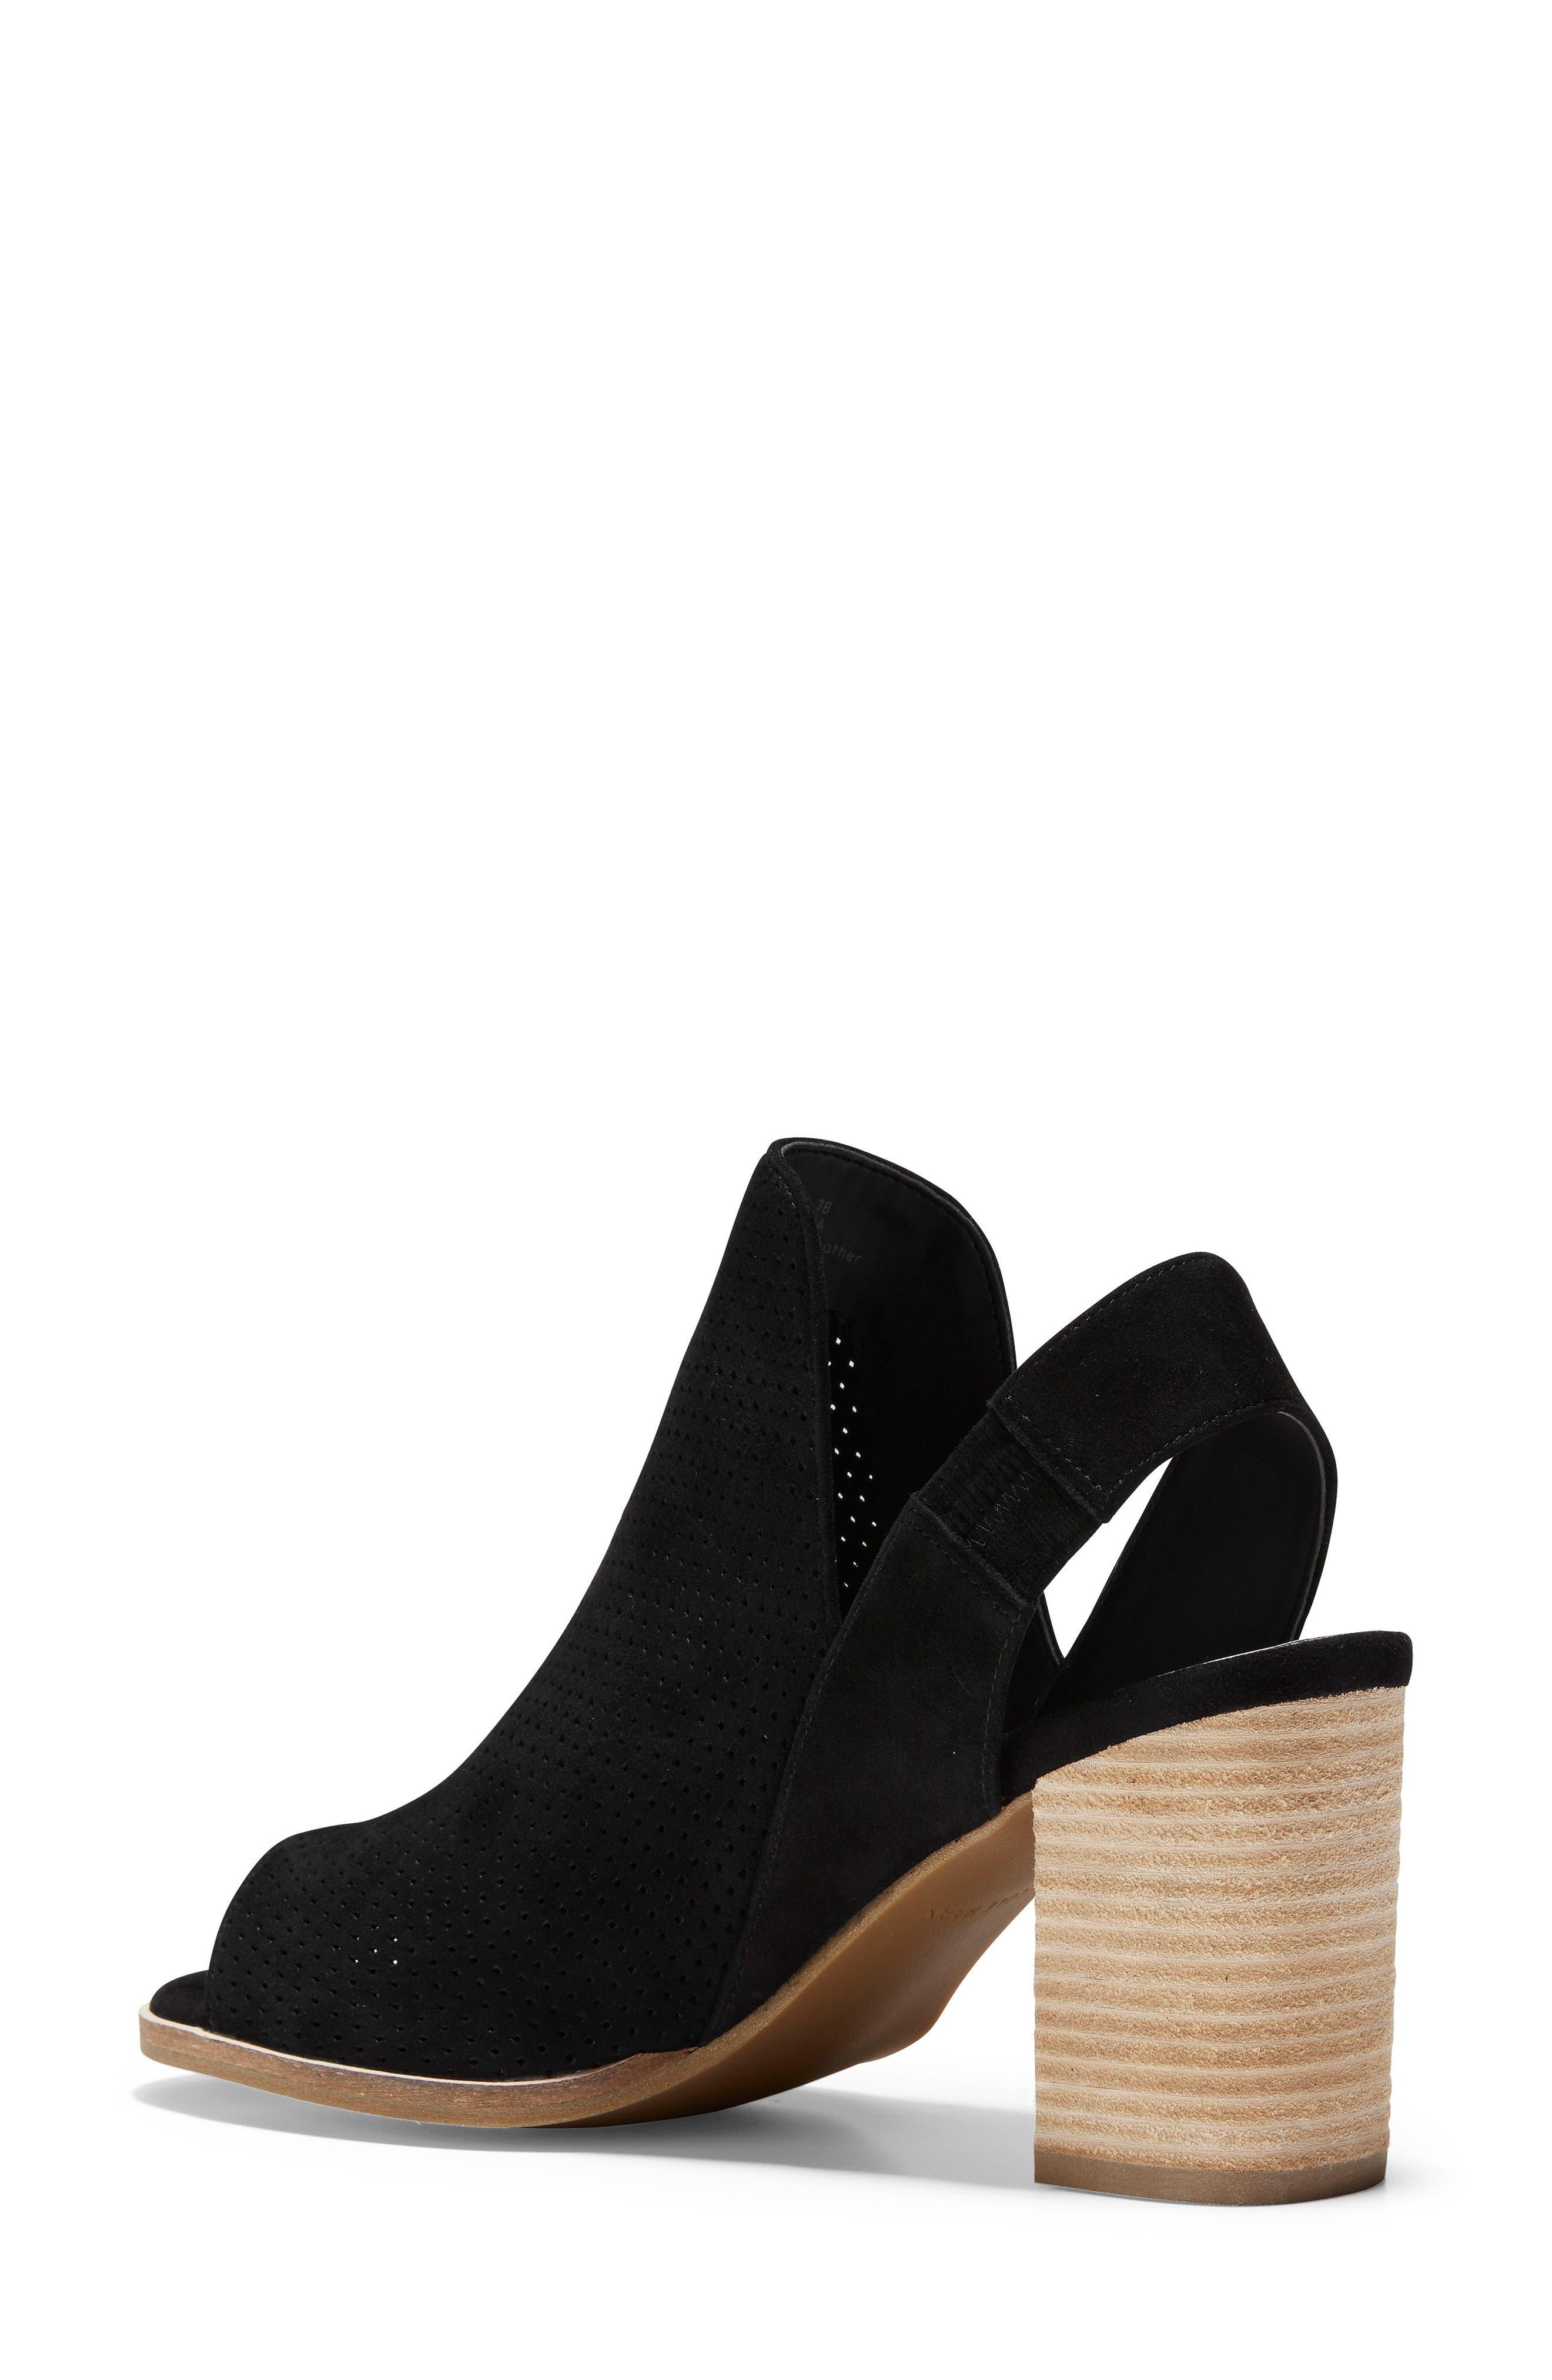 Callista Perforated Slingback Sandal,                             Alternate thumbnail 2, color,                             BLACK PERF SUEDE